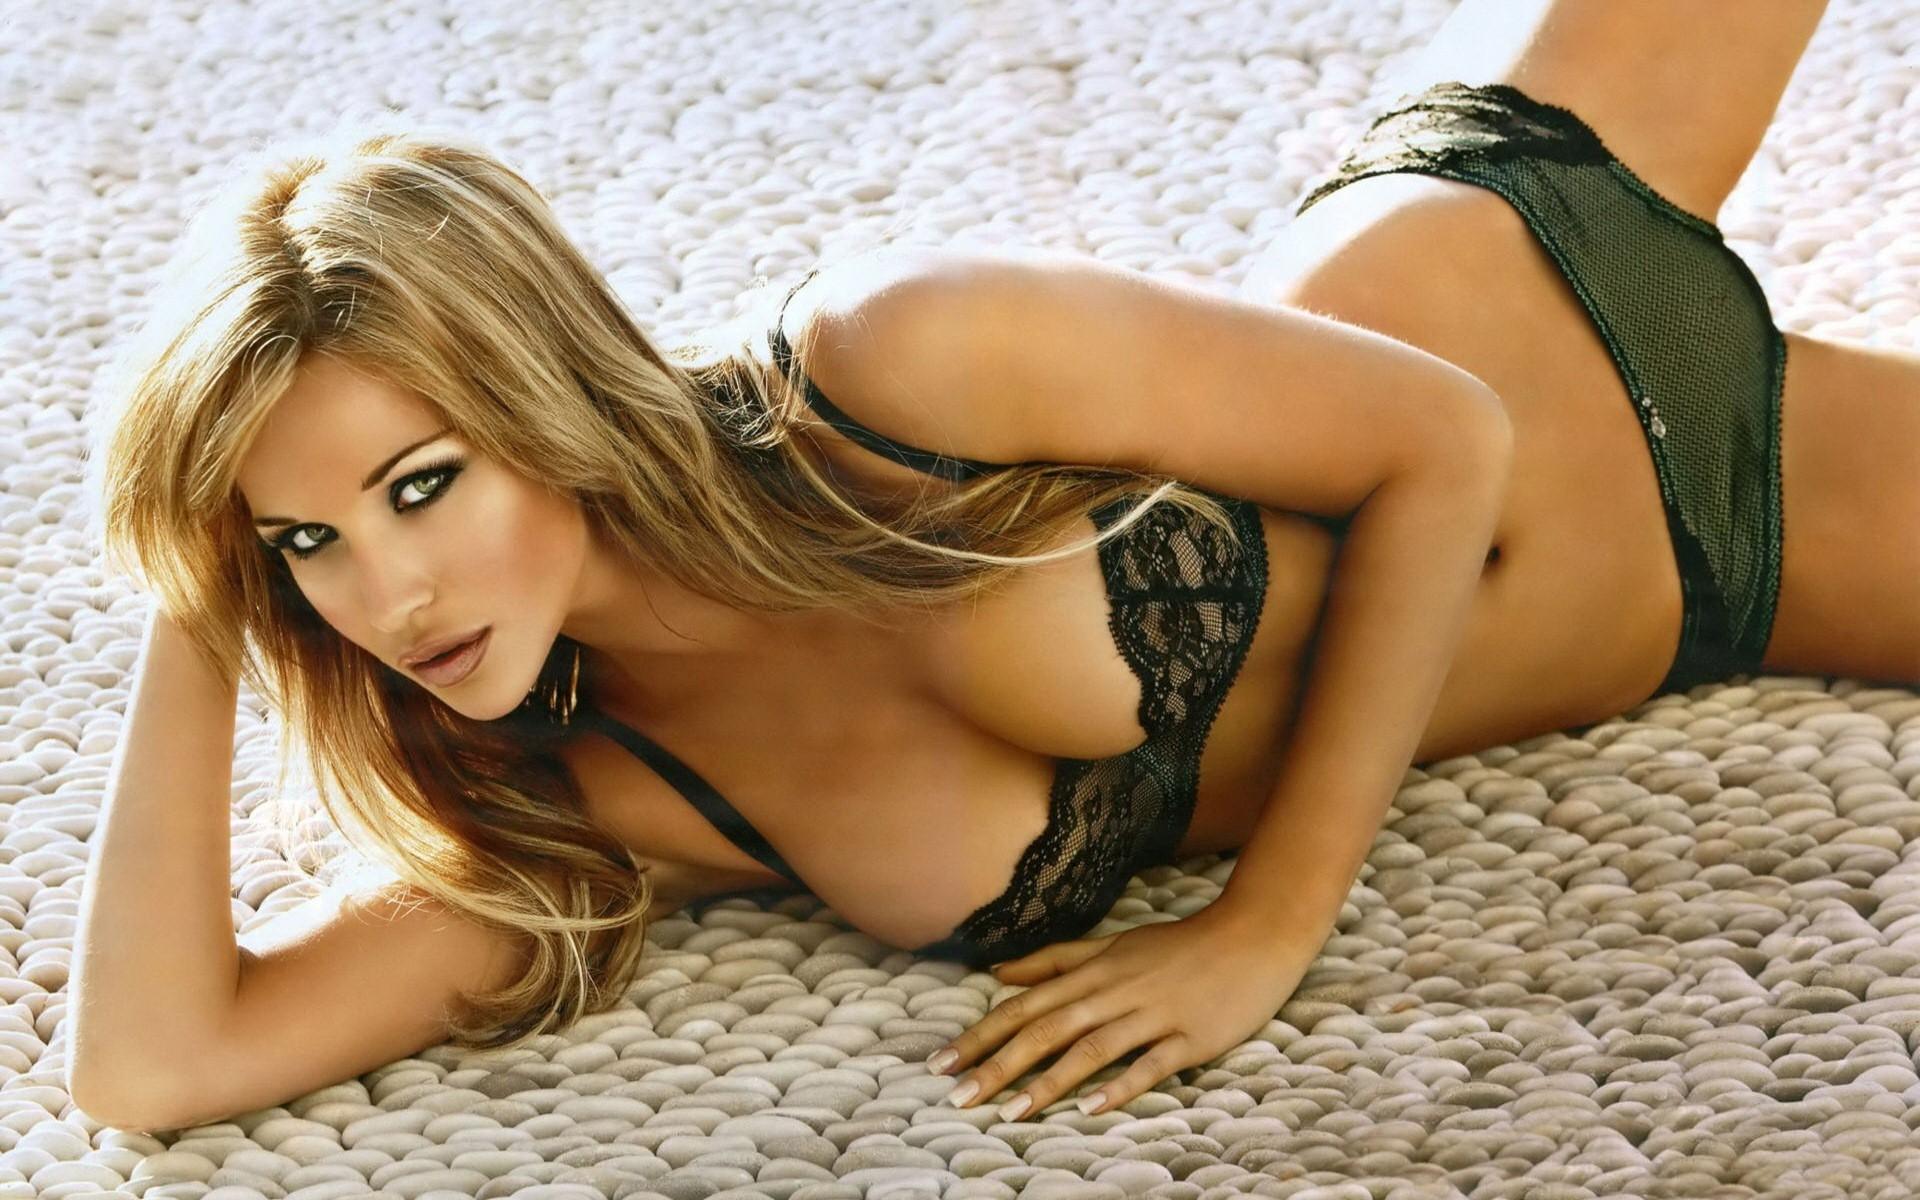 Hot sexy beautiful fine babe girl